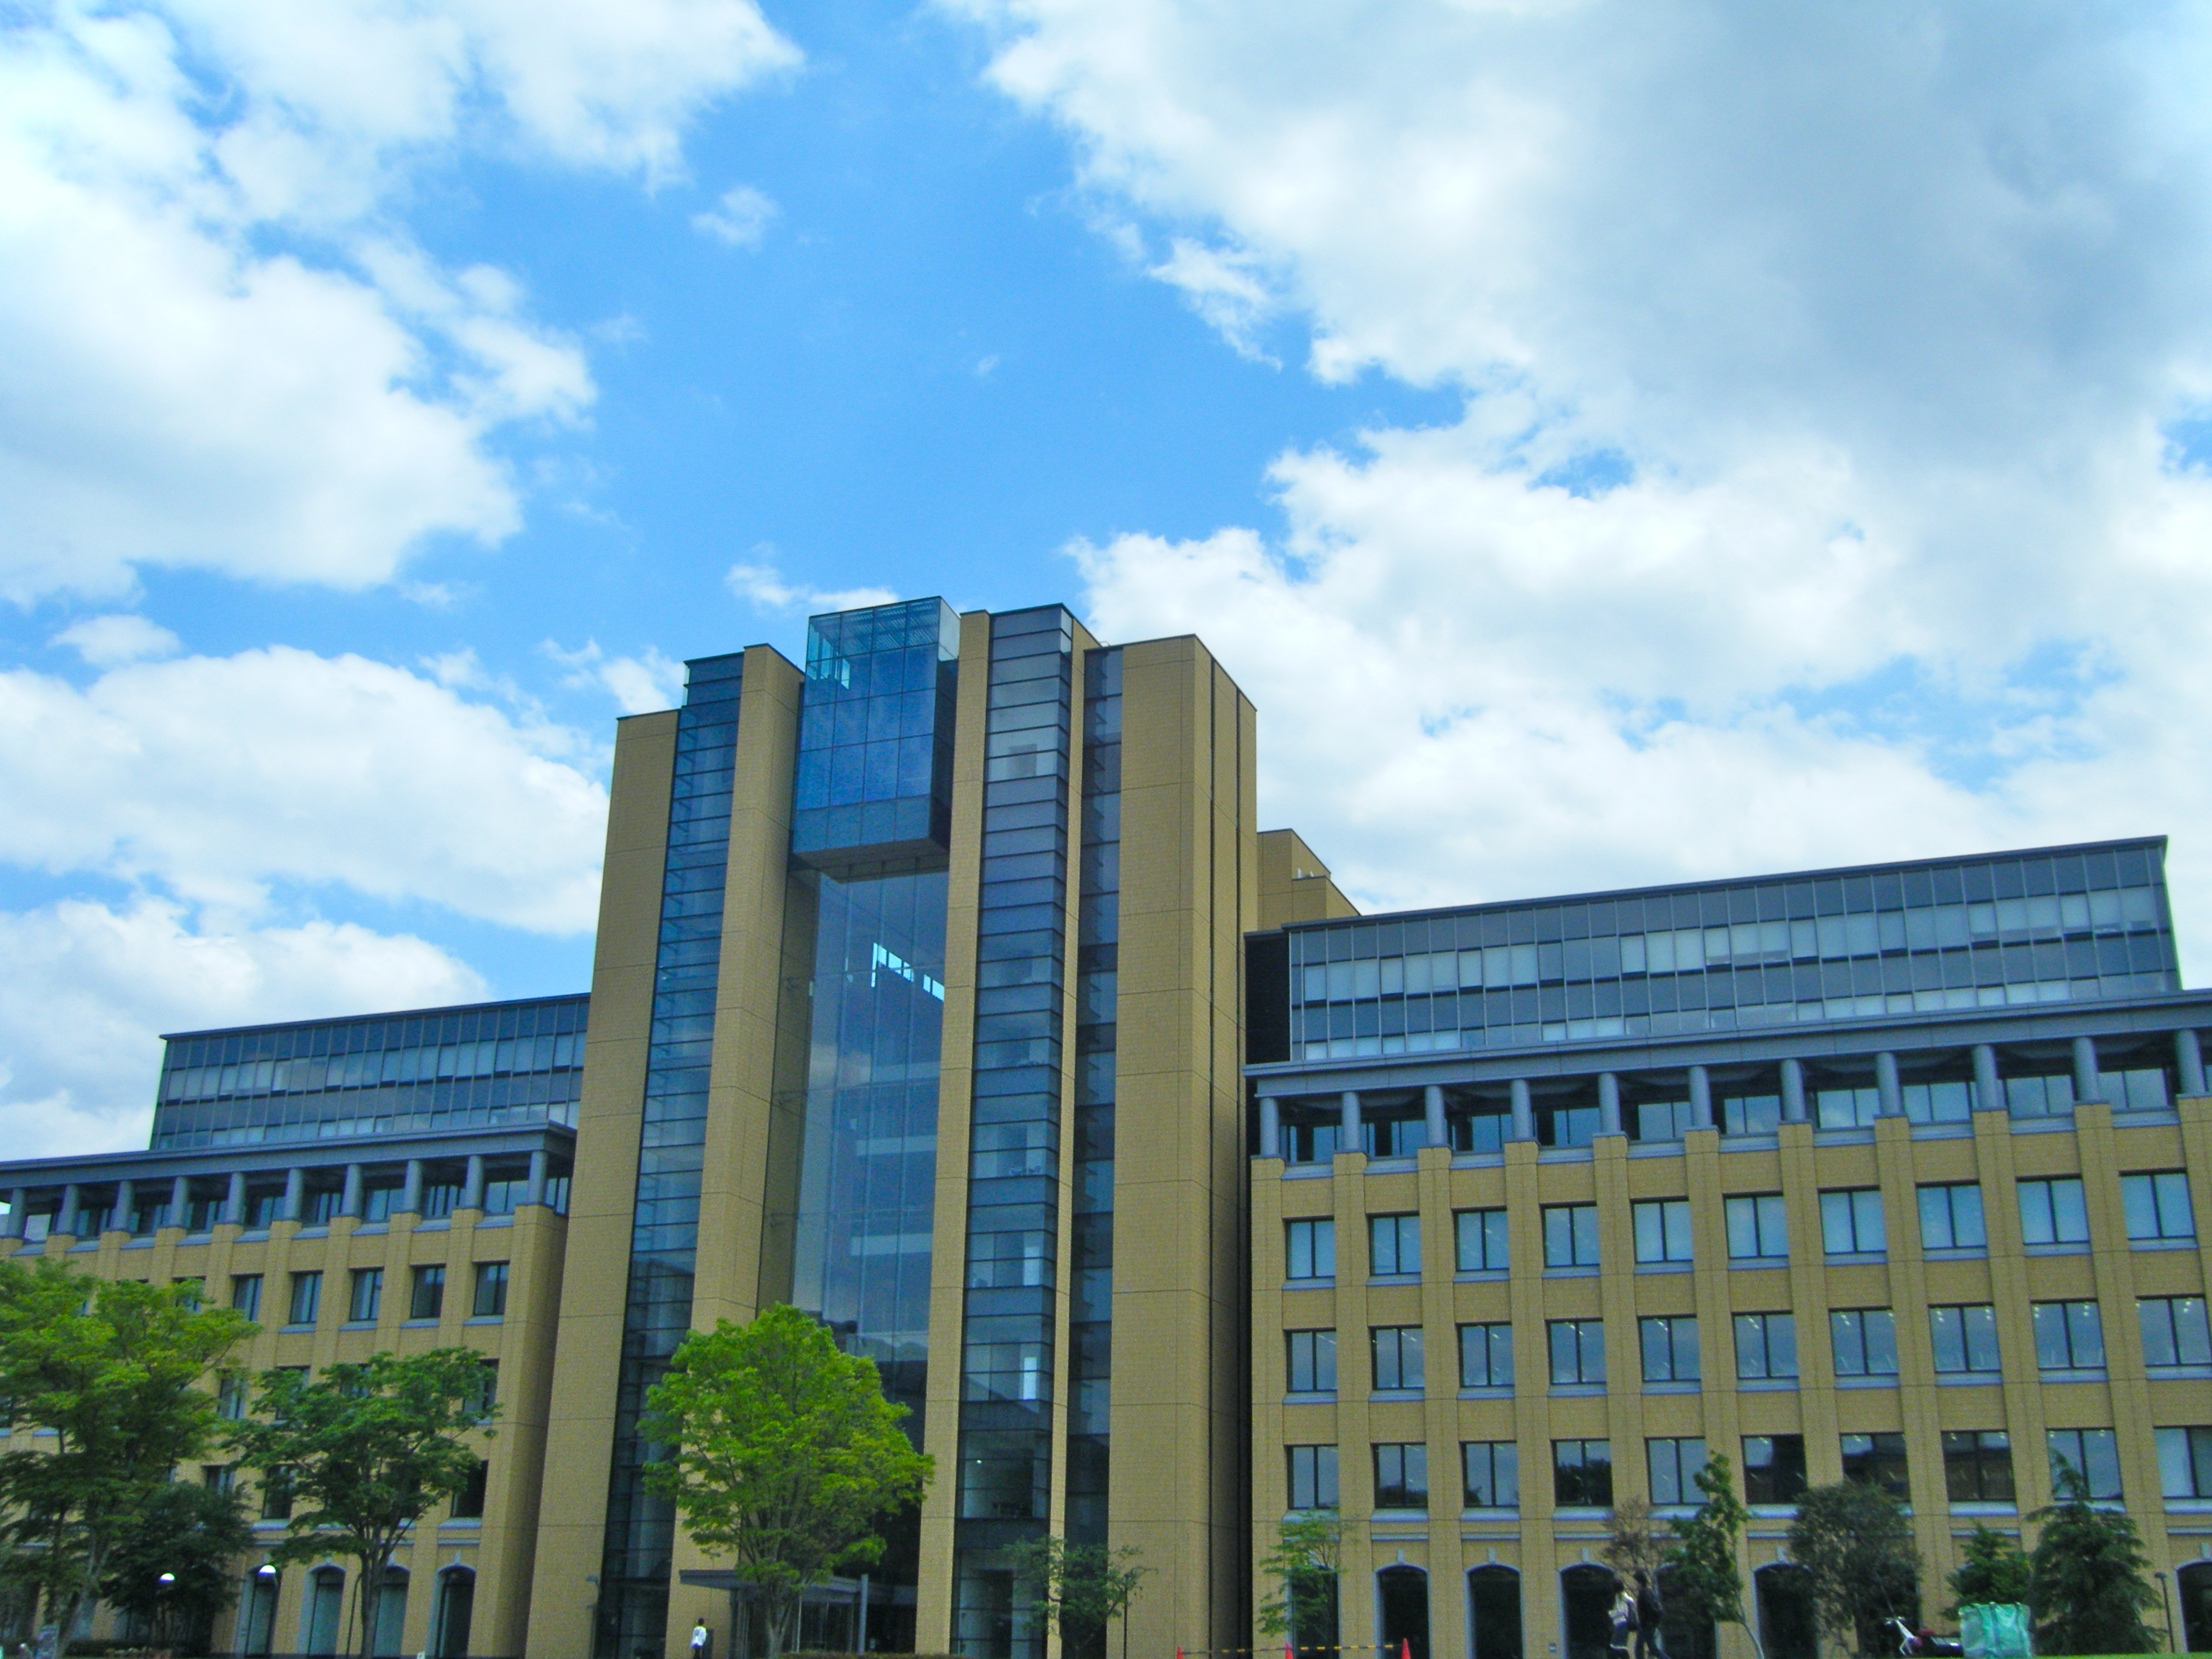 関東学院大学 page 5 2015年以前の画像検索 imageseek